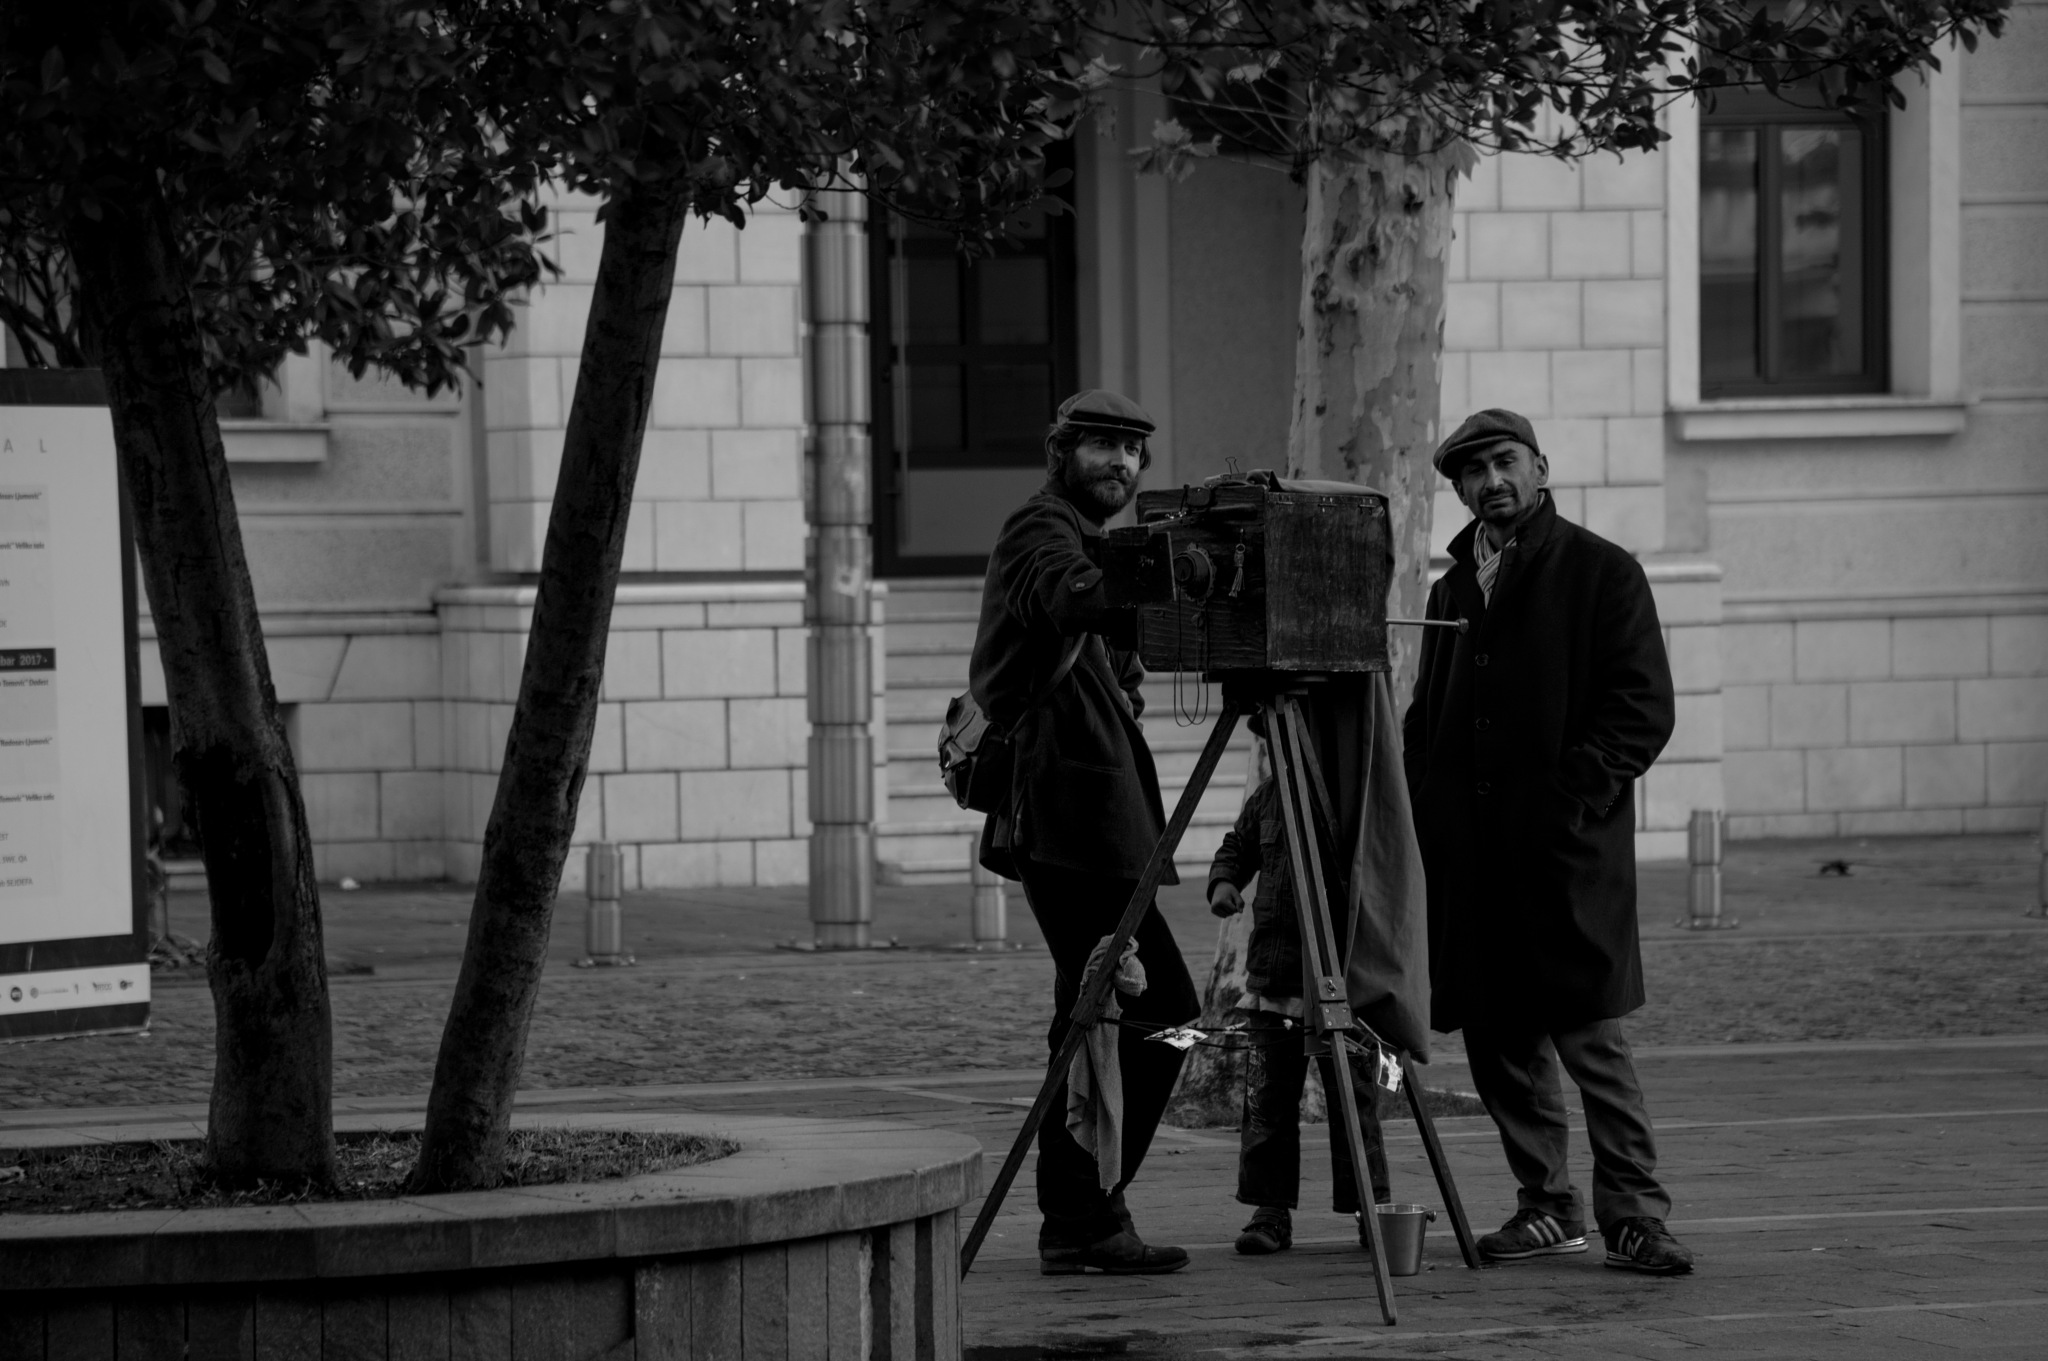 Street fotograf by dusanvladimir